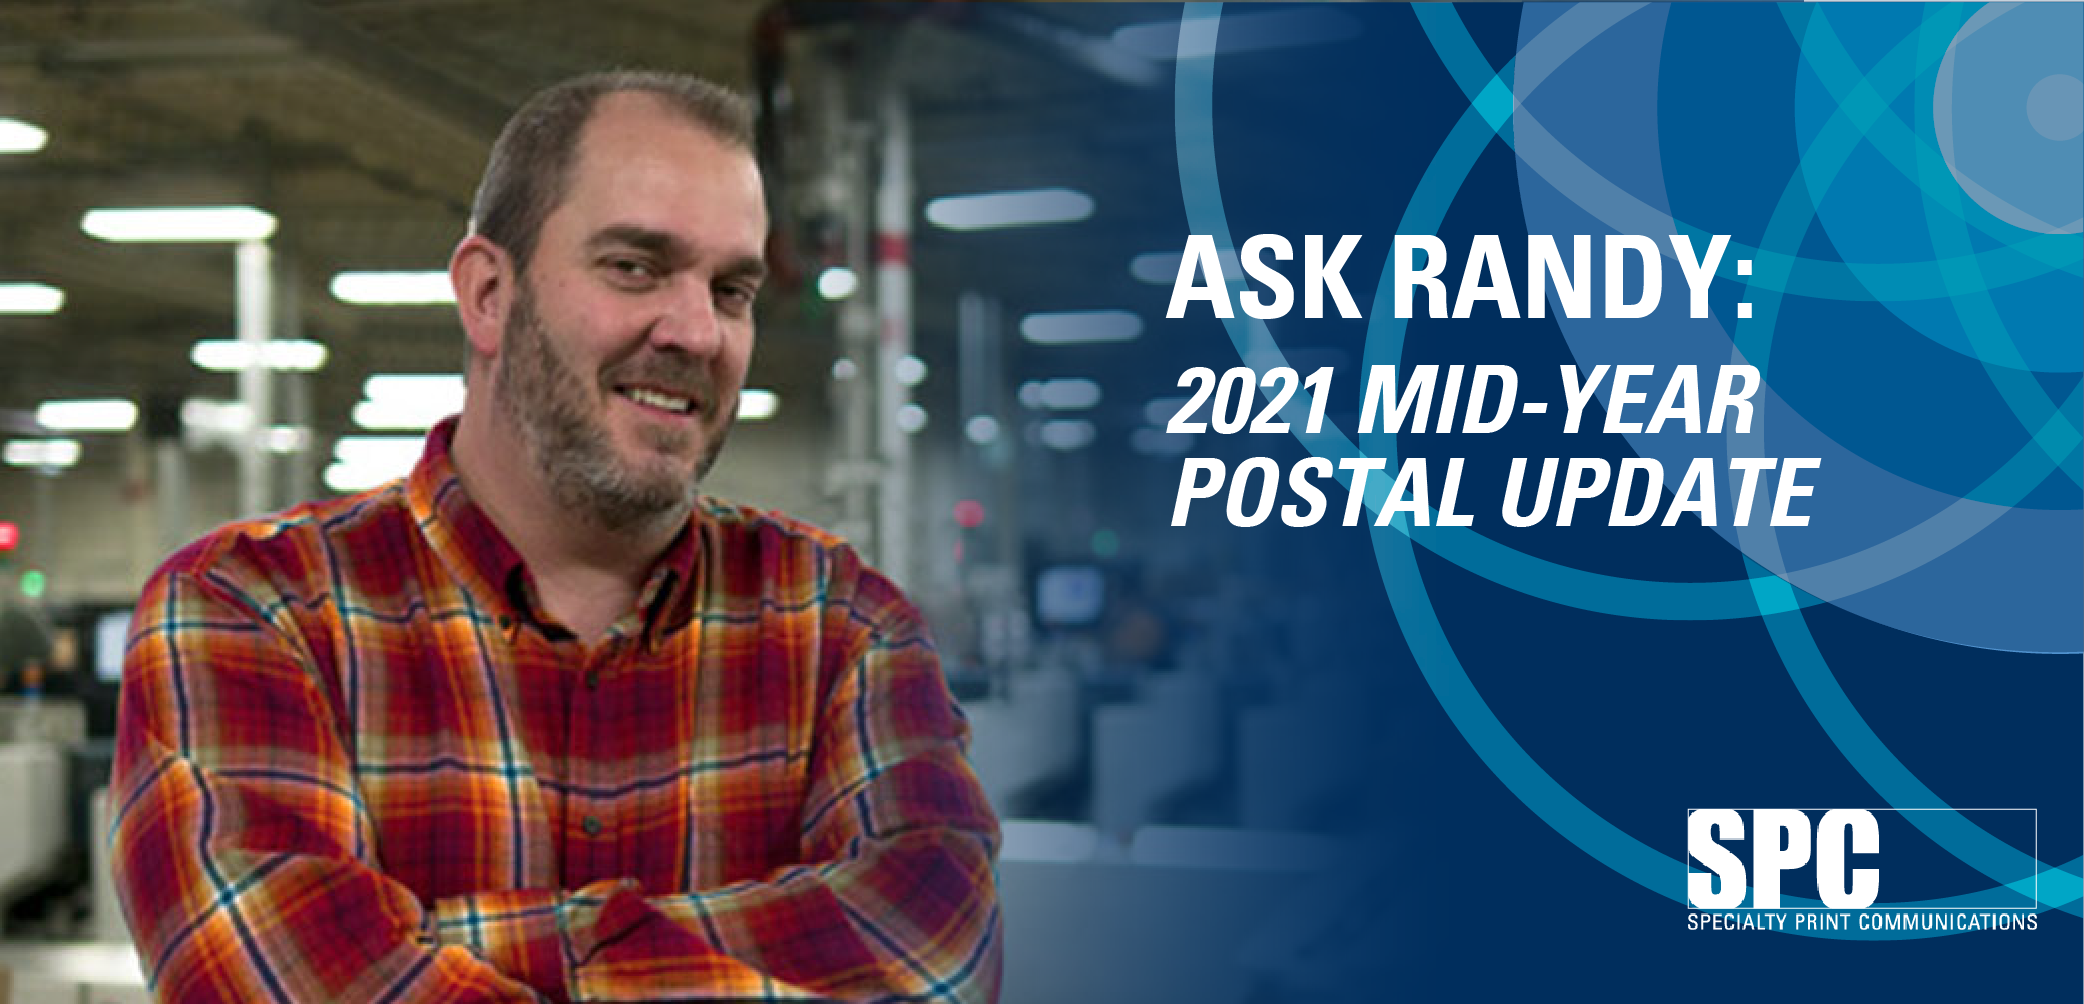 Ask Randy: 2021 Mid-Year Postal Update